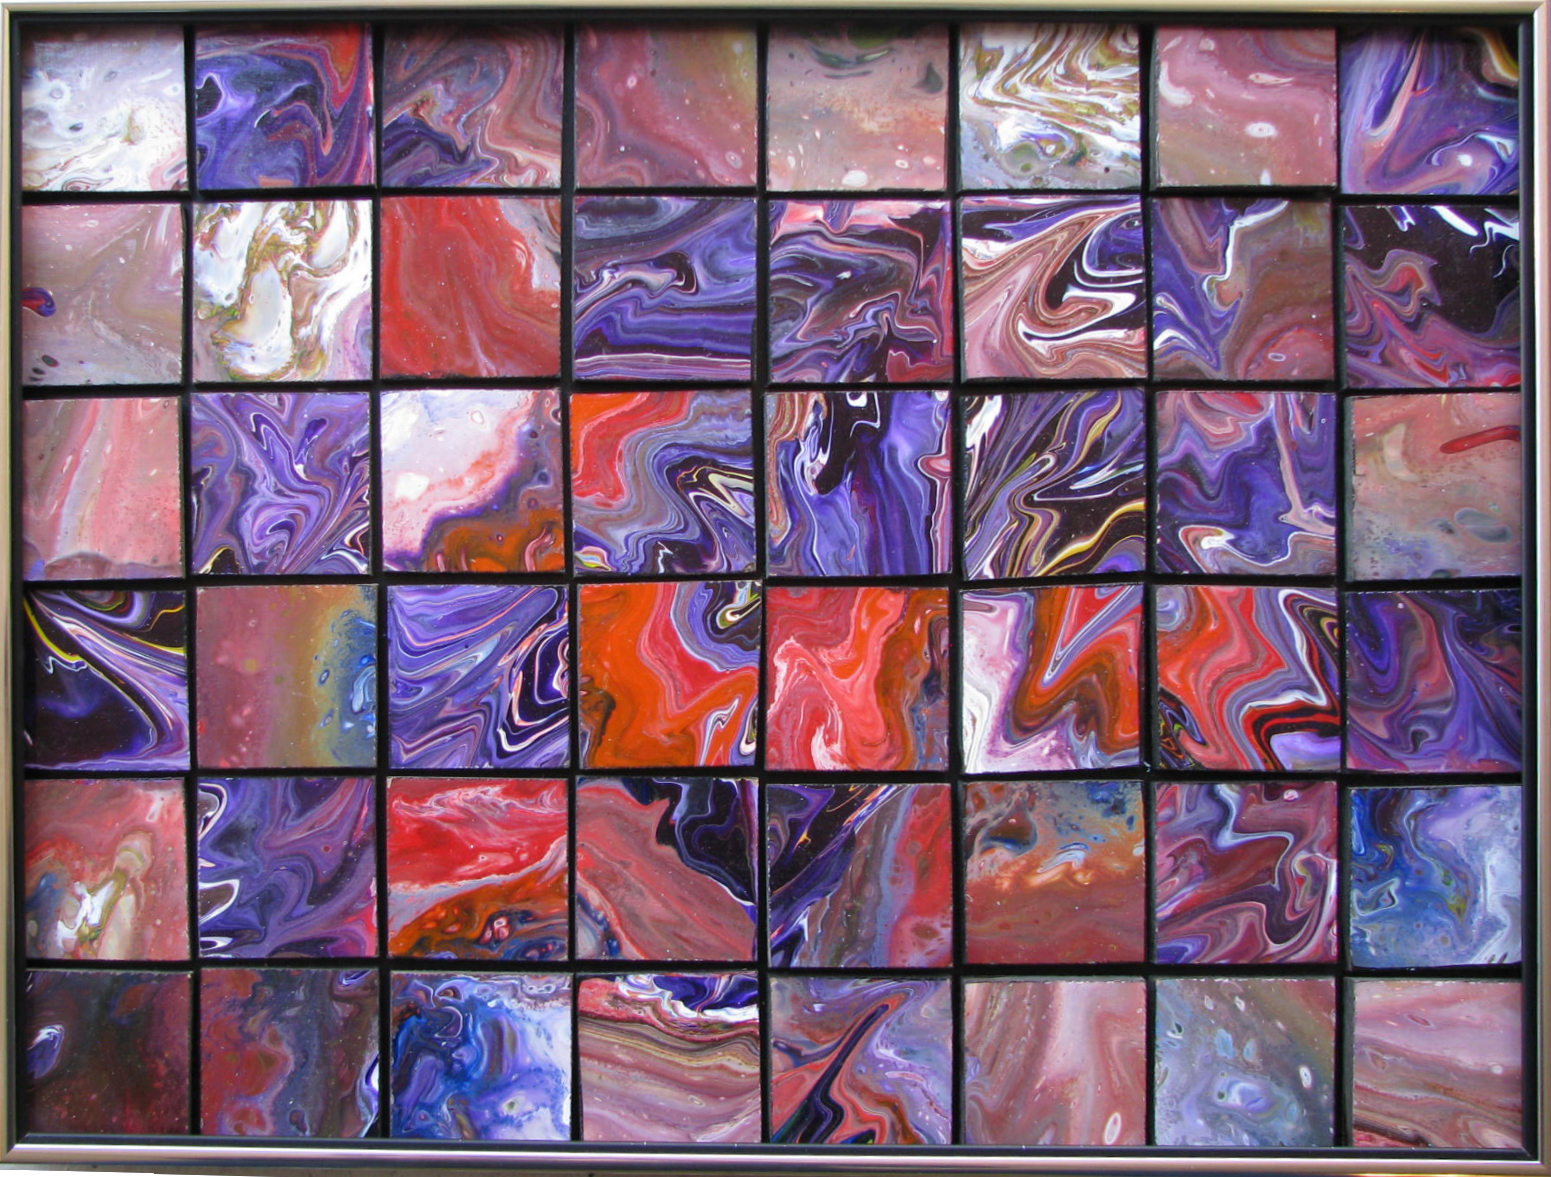 Mosaic, Ben Childers